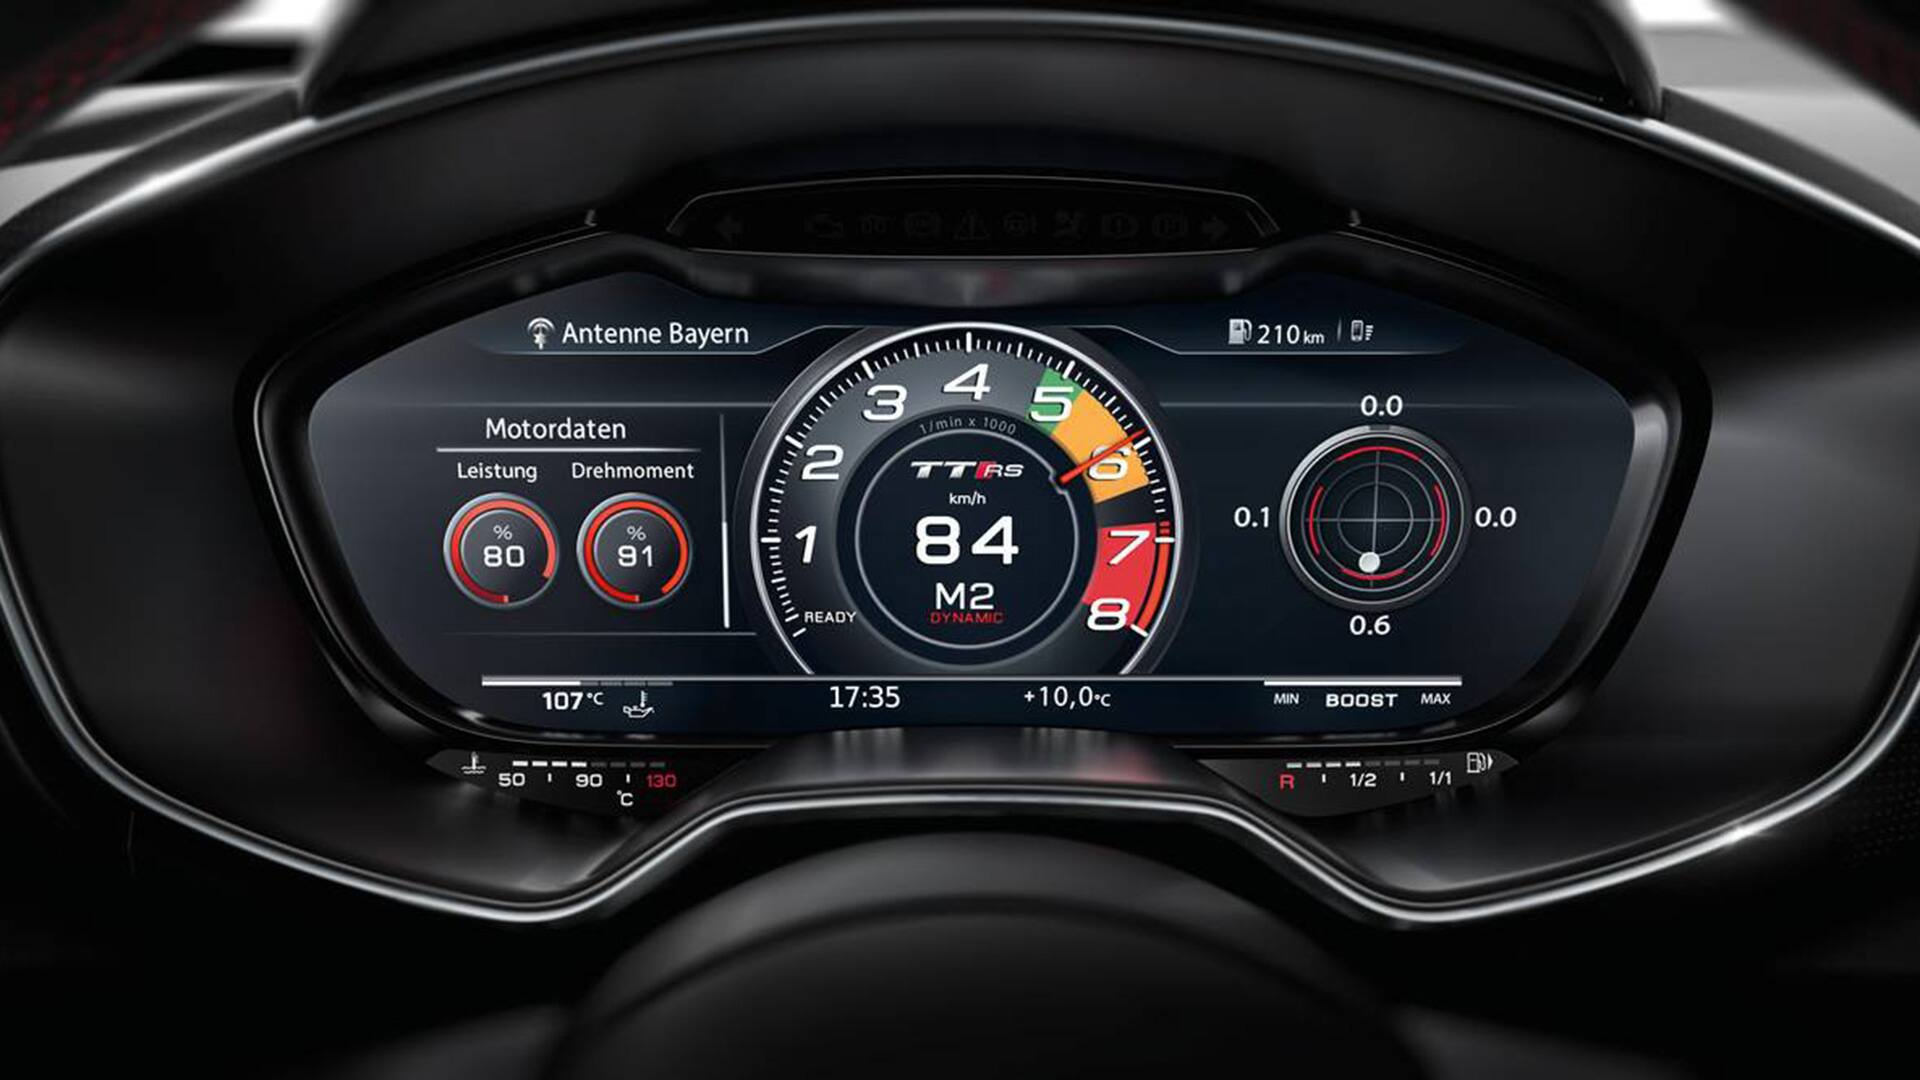 Audi TTRS Coupe' 2019 > Audi TT 2019 > Audi Saudi Arabia